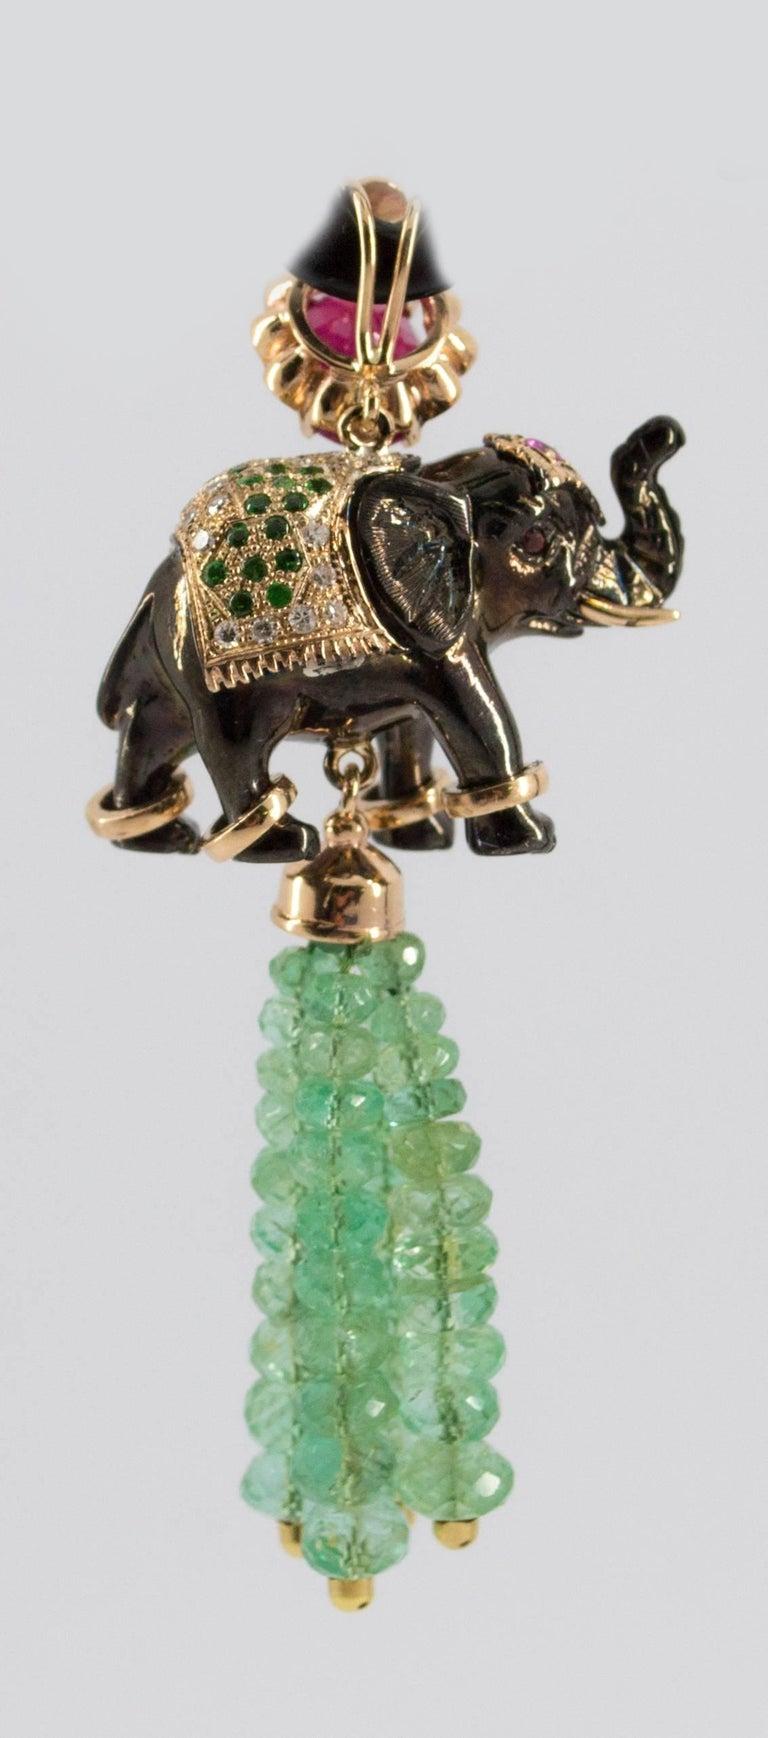 19.90 Carat Emerald 3.10 Carat Ruby Tsavorite Yellow Gold Elephant Pendant For Sale 10